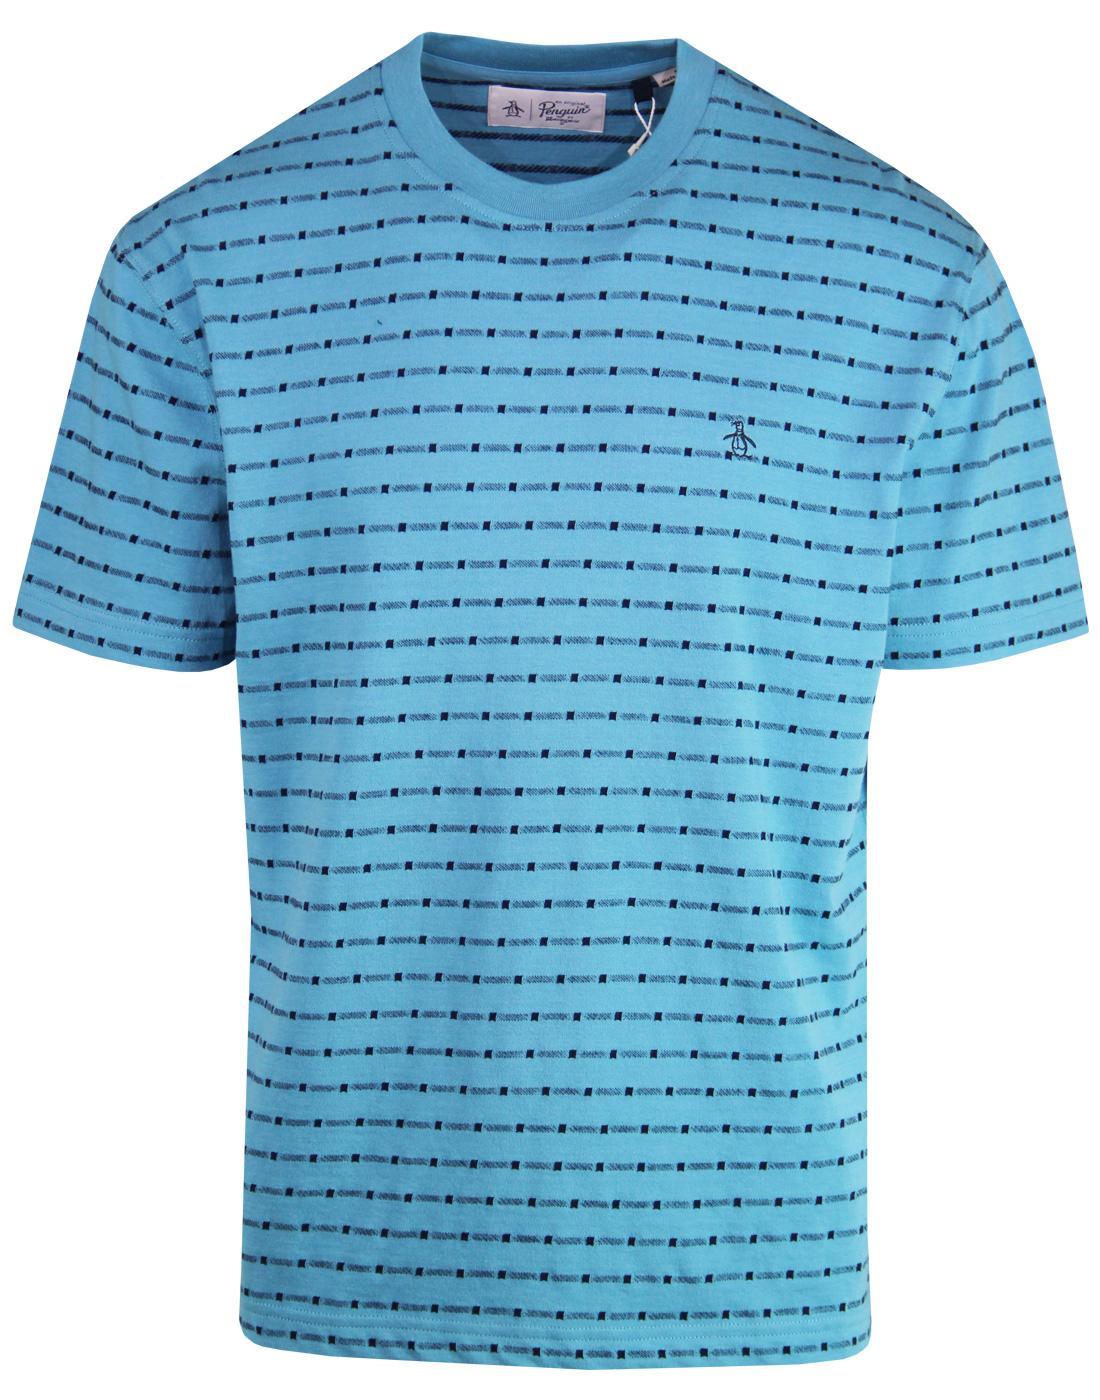 ORIGINAL PENGUIN Mens Retro 8 Bit Jacquard T-shirt